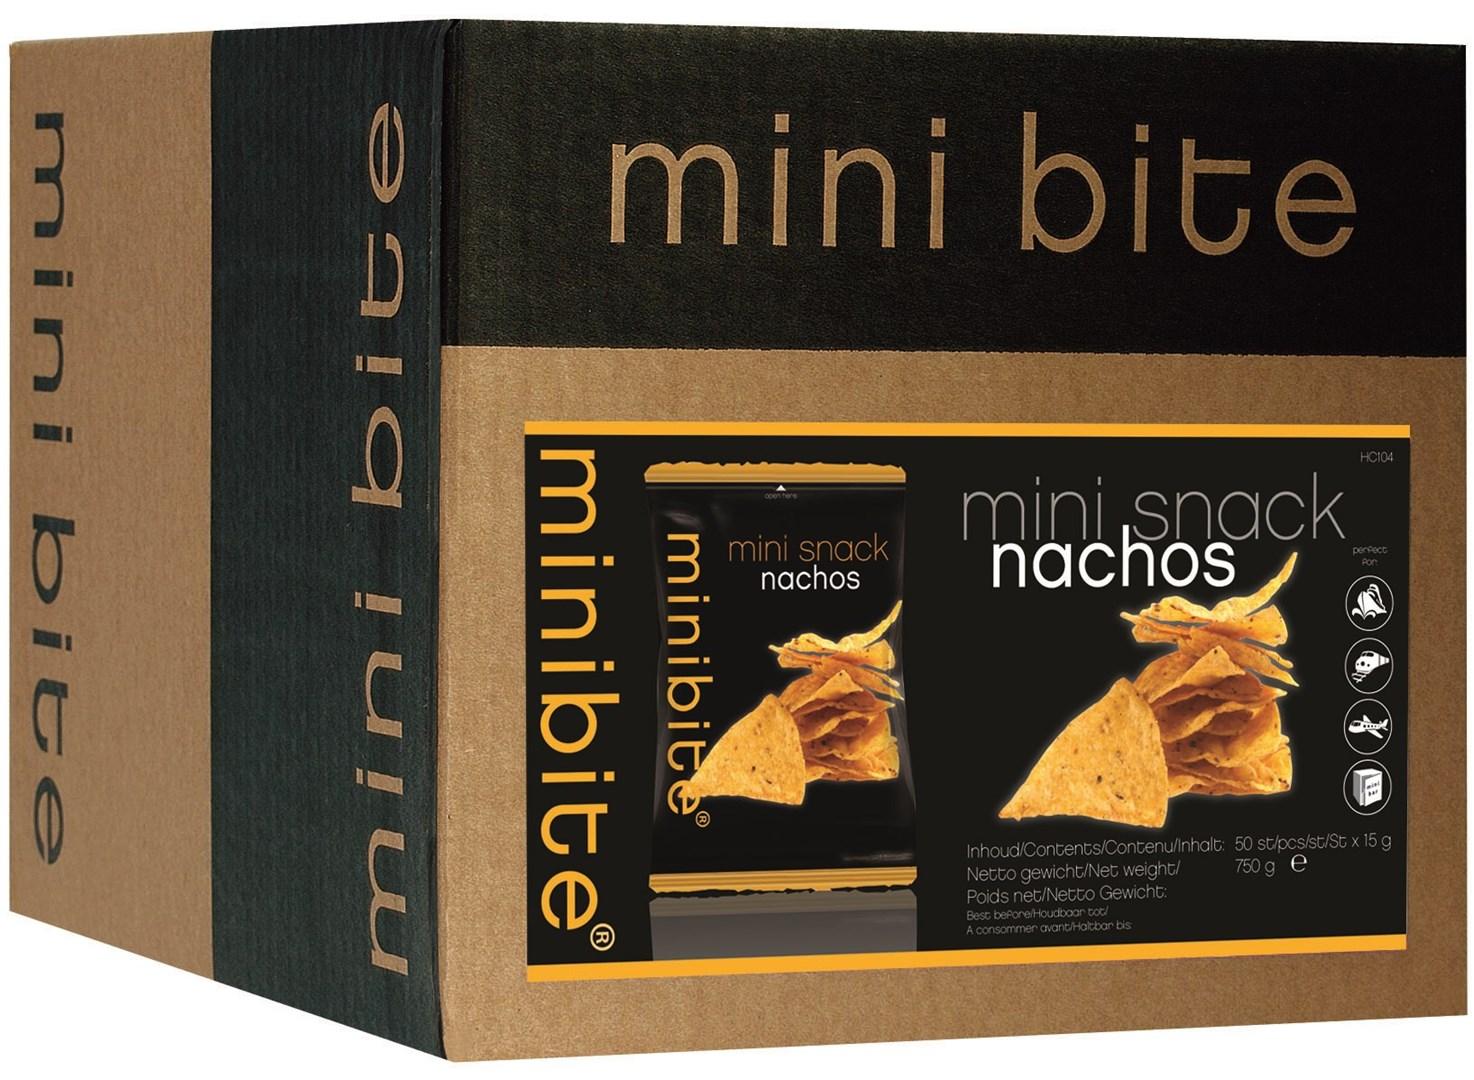 Productafbeelding Mini bite nachos